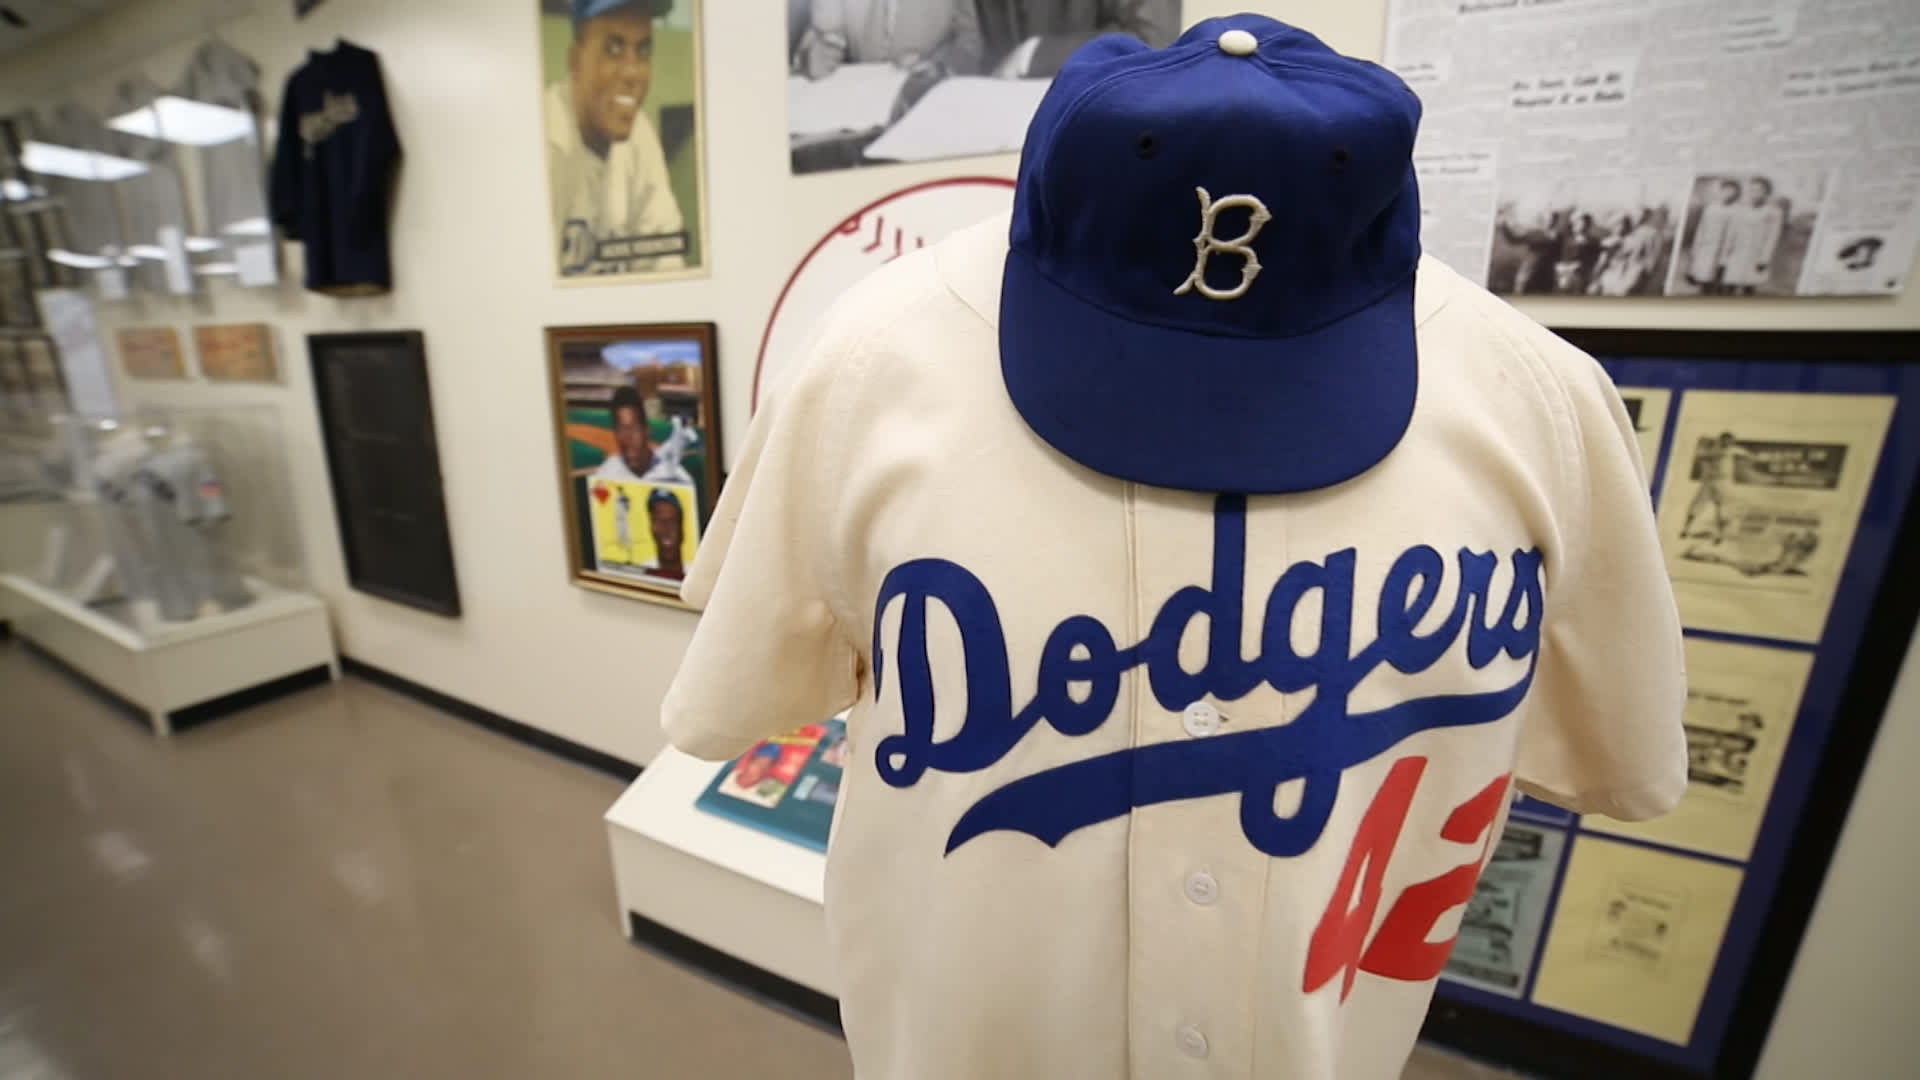 a3483e14faa See Dodgers fan s rare baseball memorabilia collection